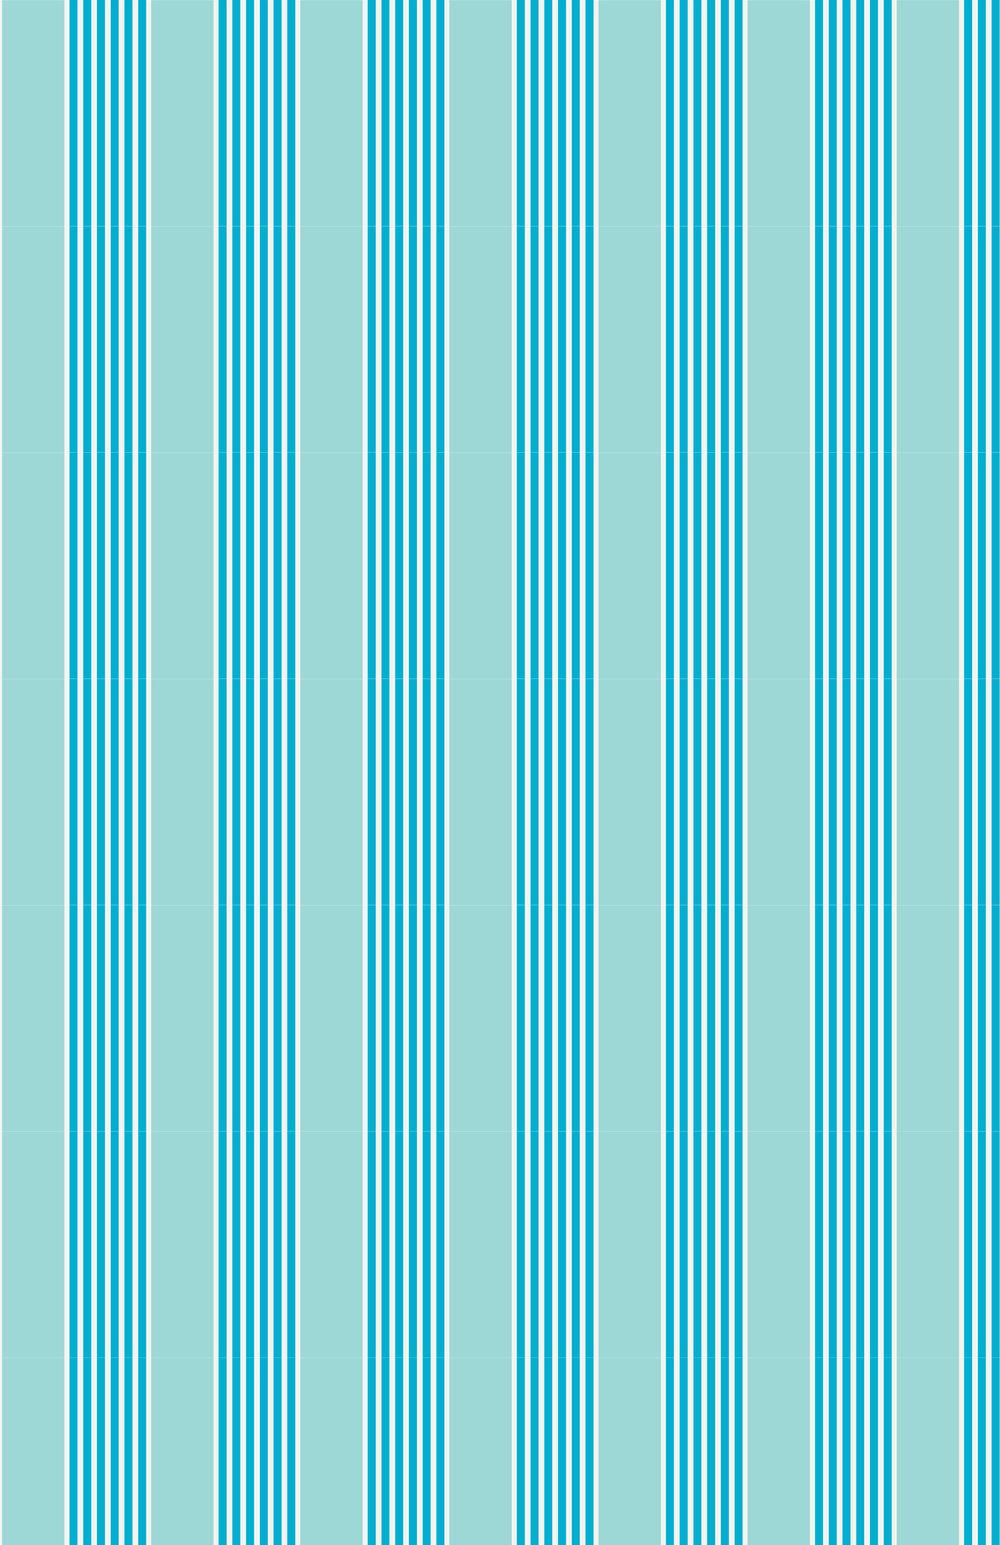 stripes-03.jpg